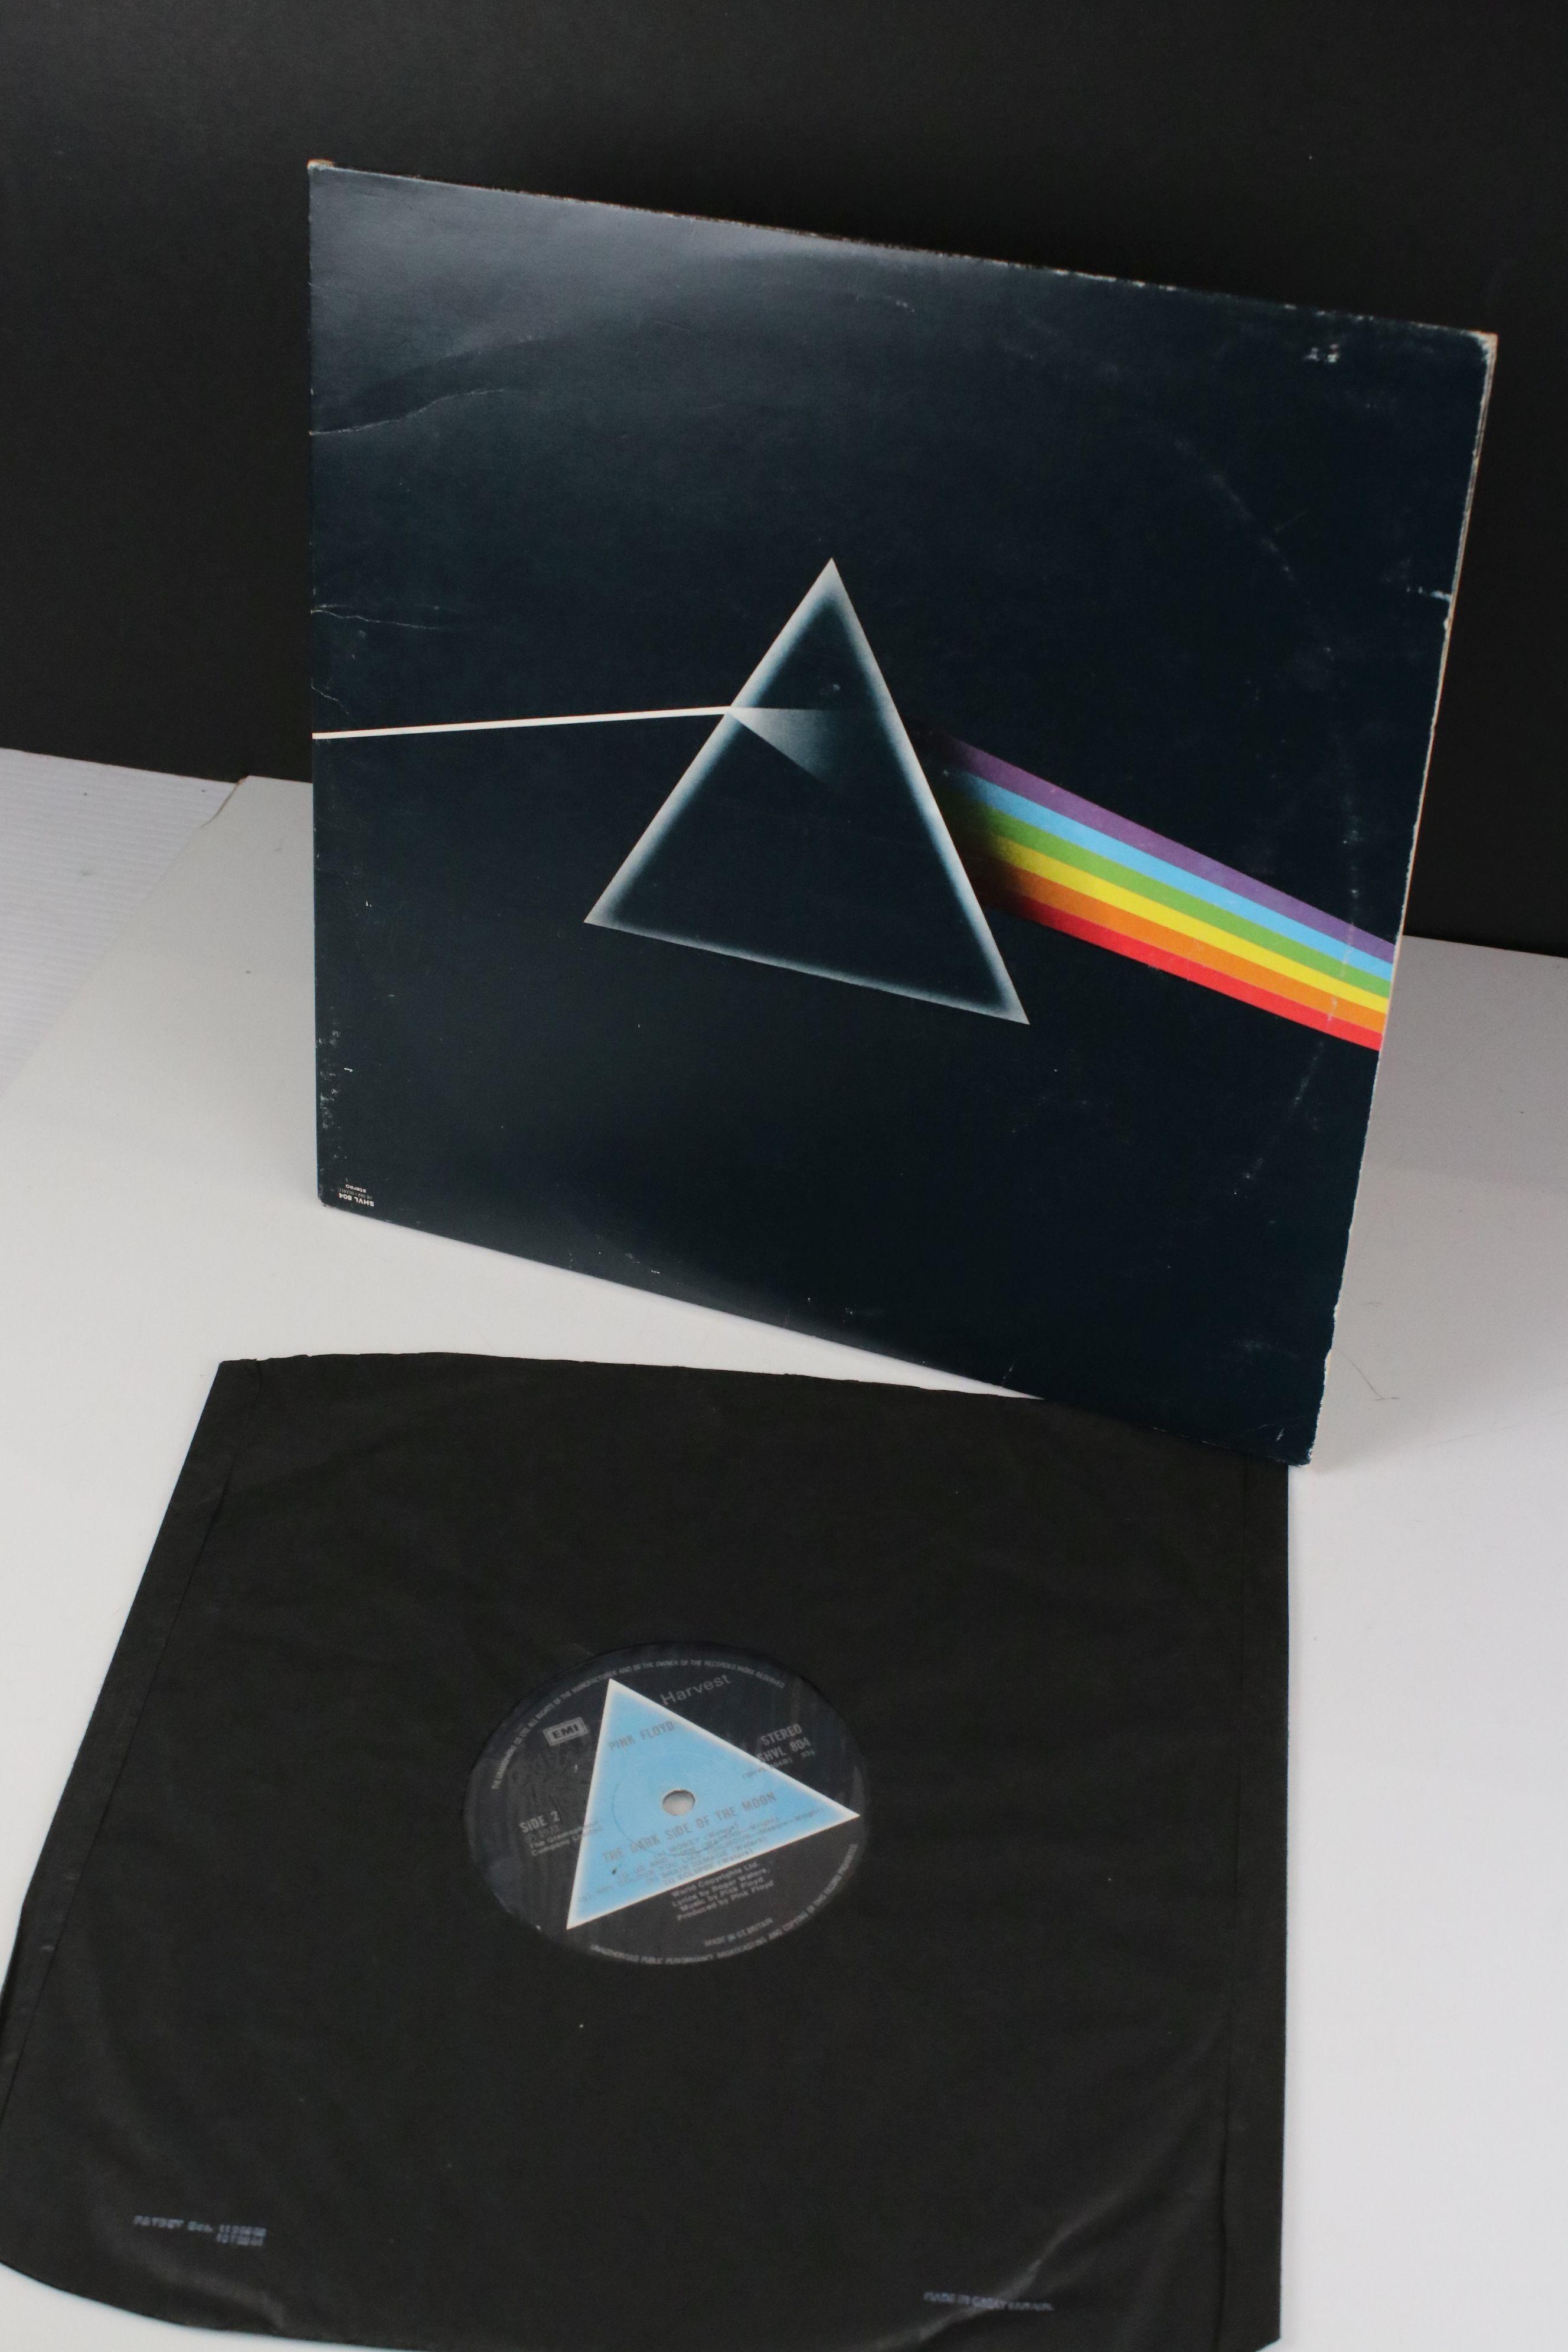 Vinyl - Pink Floyd Dark Side of The Moon LP on Harvest SHVL804 Stereo, solid light blue triangle, no - Image 6 of 6